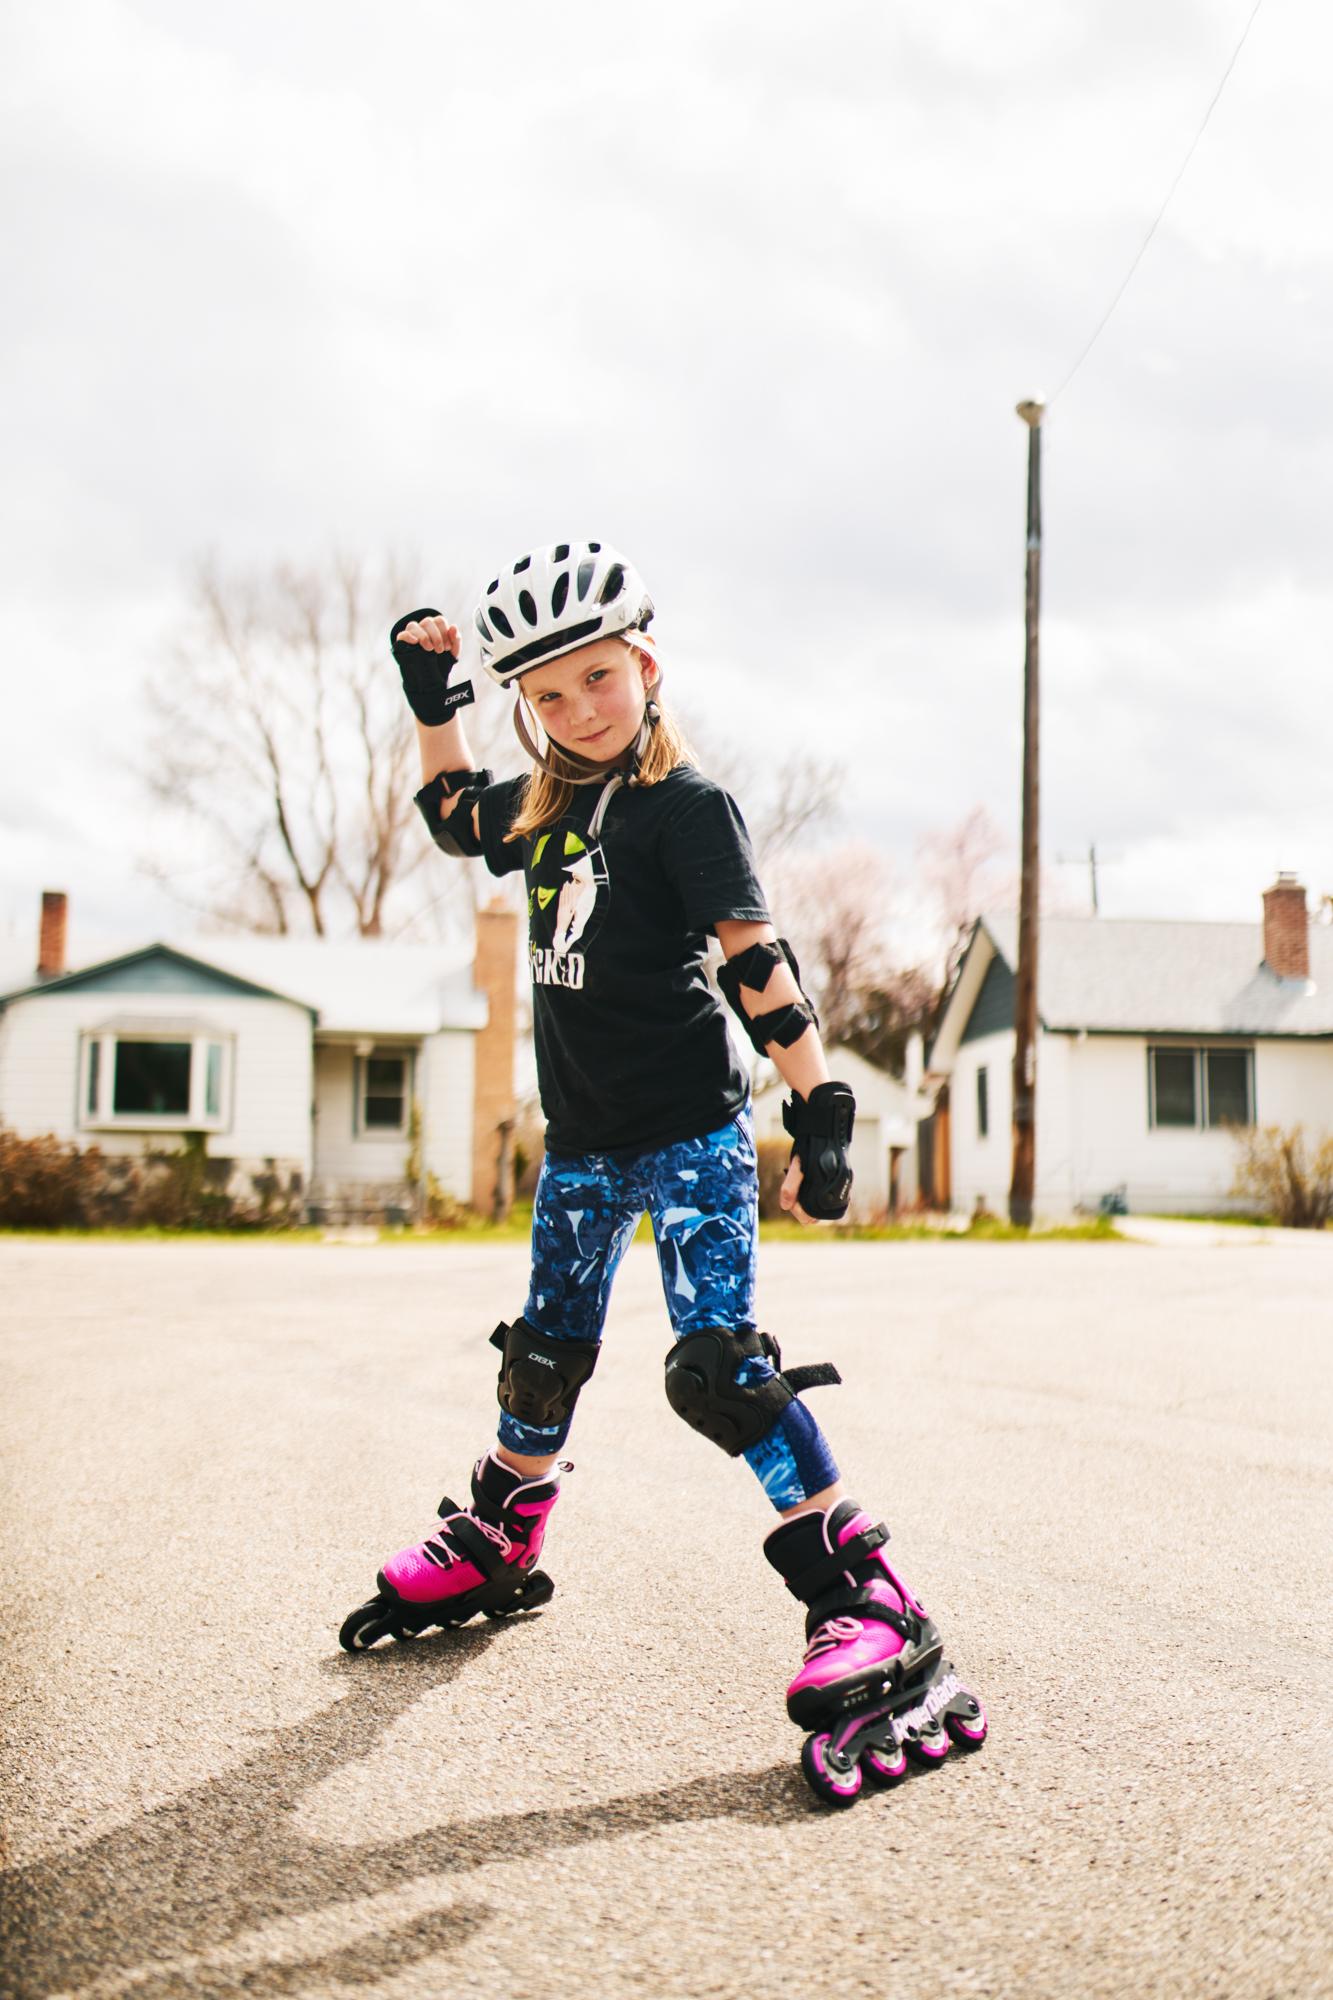 2019-4-6 Zoe Rollerblading-017 copy.jpg